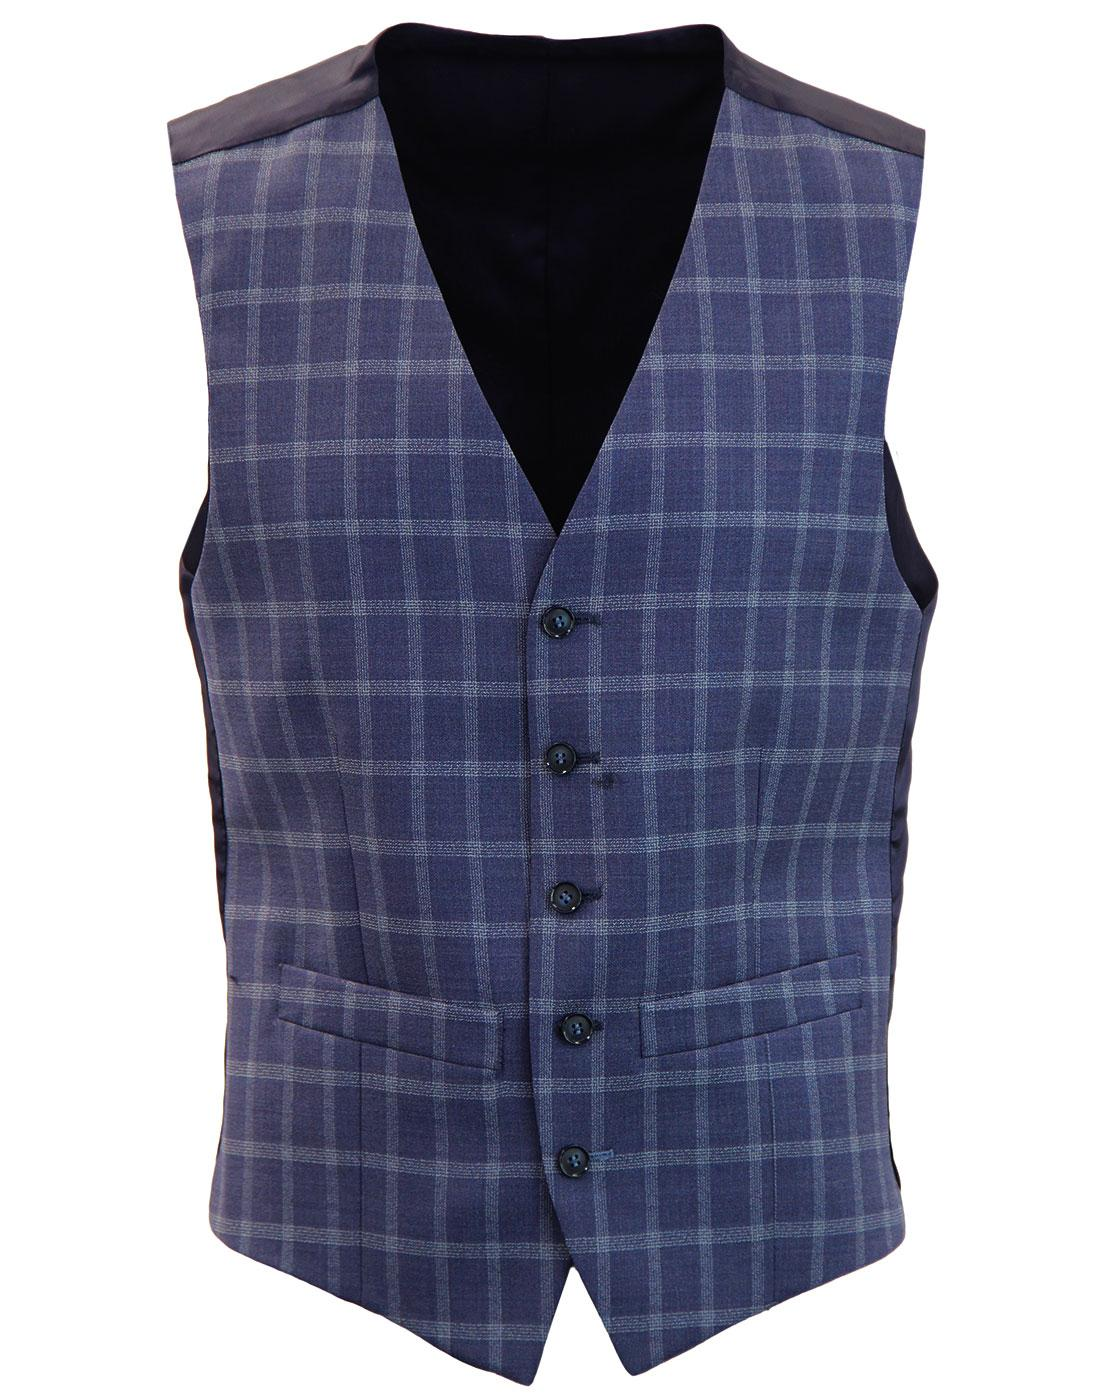 Men's Retro 1960s Mod Block Check Waistcoat BLUE